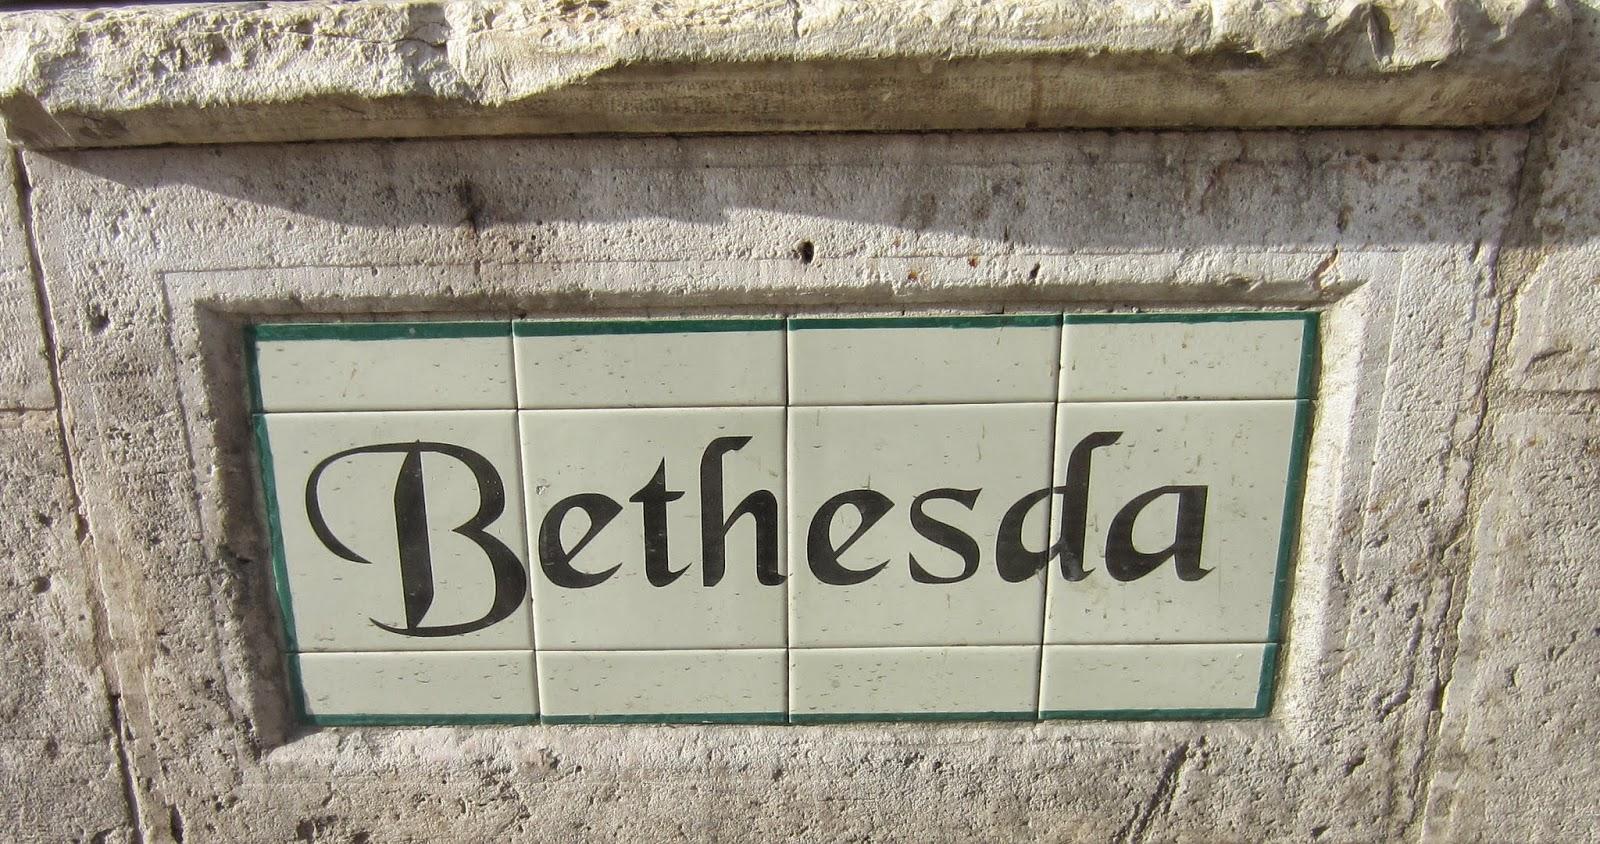 bethesda - photo #11